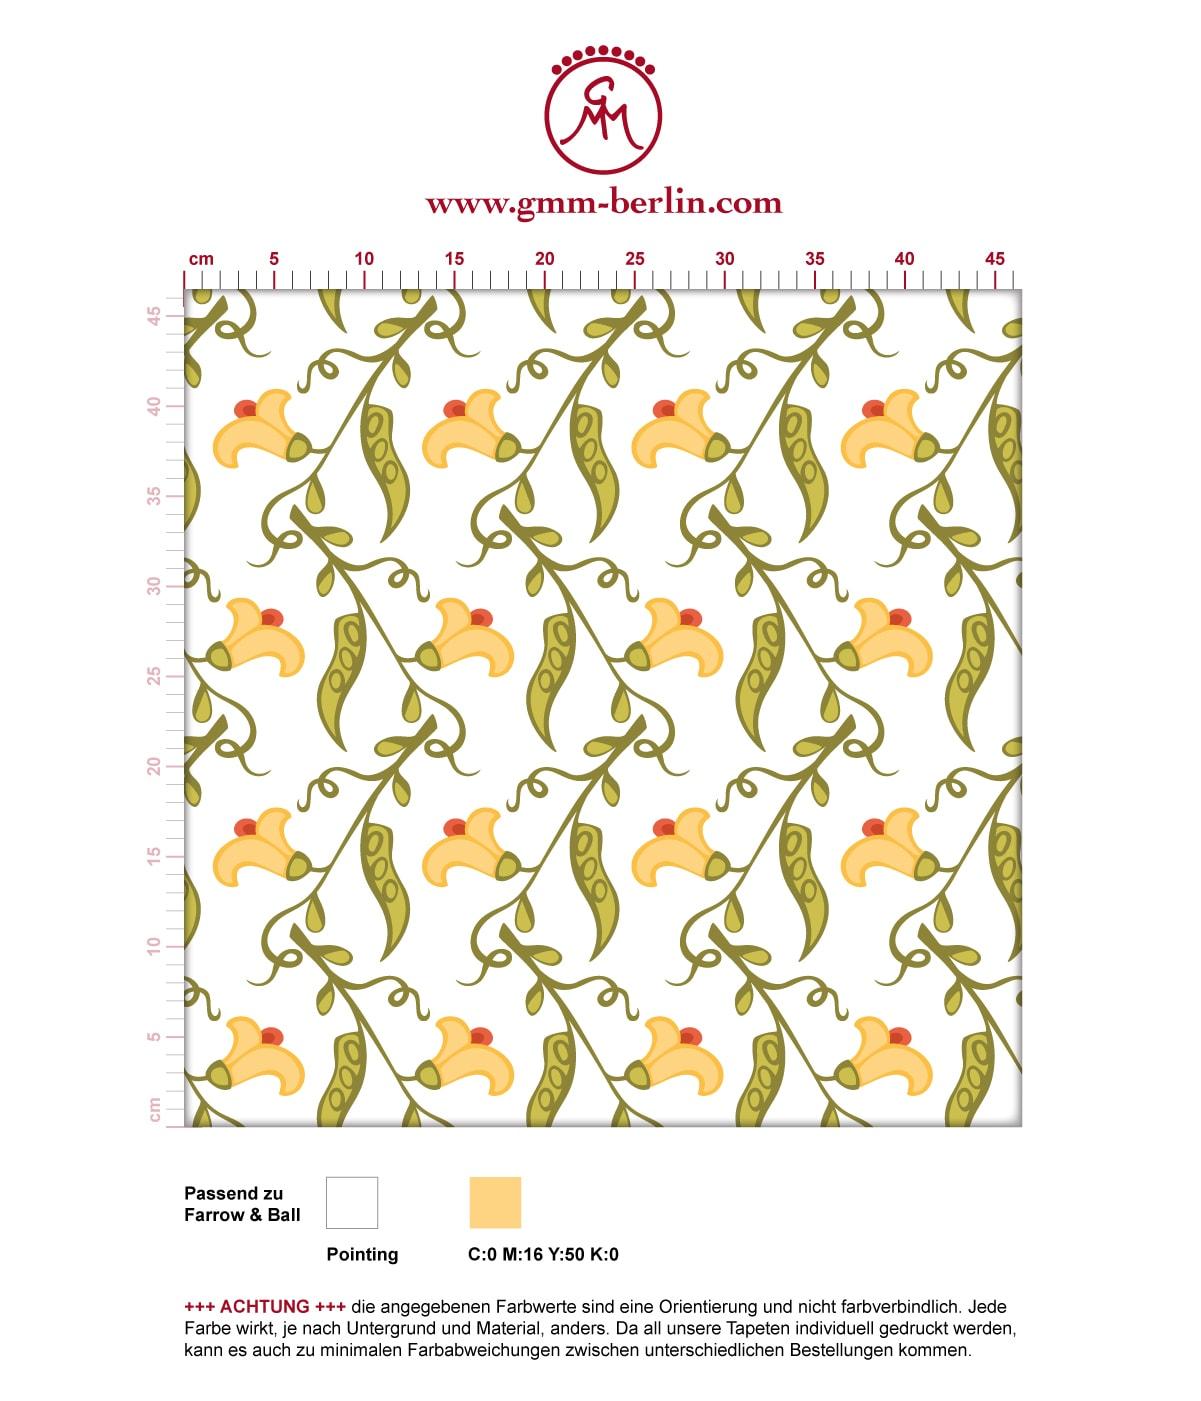 "Groß gemusterte klassisch frische Tapete ""Happy Peas"" mit blühenden Erbsen Ranken angepasst an Farrow and Ball Wandfarben. Aus dem GMM-BERLIN.com Sortiment: Schöne Tapeten in weiss"